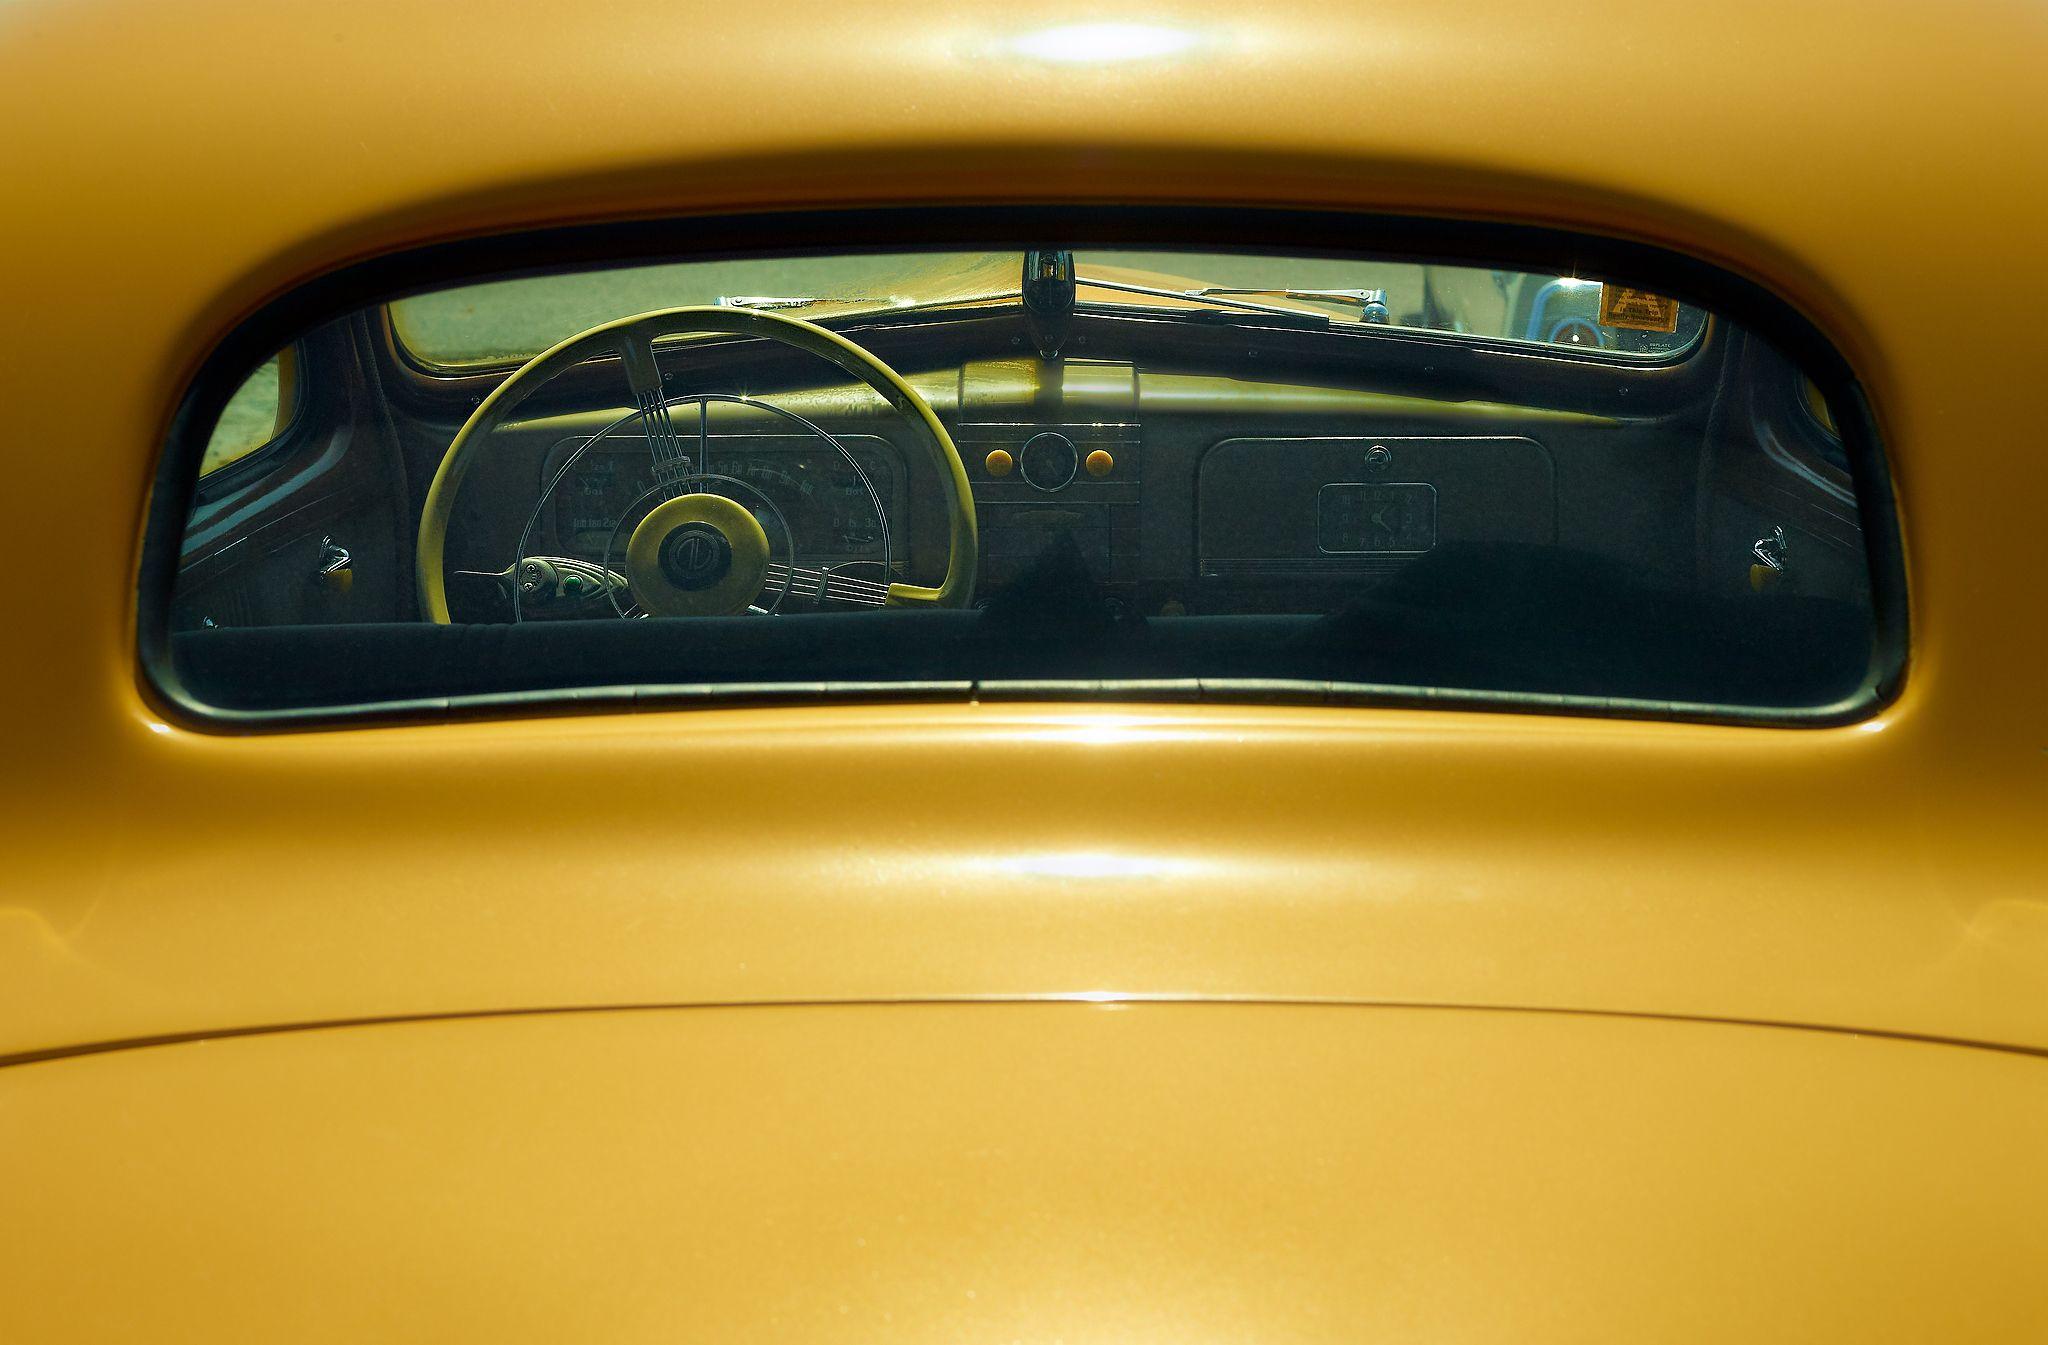 online copart en amarillo ltz view malibu left auto acfe in chevrolet vehicle auctions lot sale on tx carfinder maroon salvage title